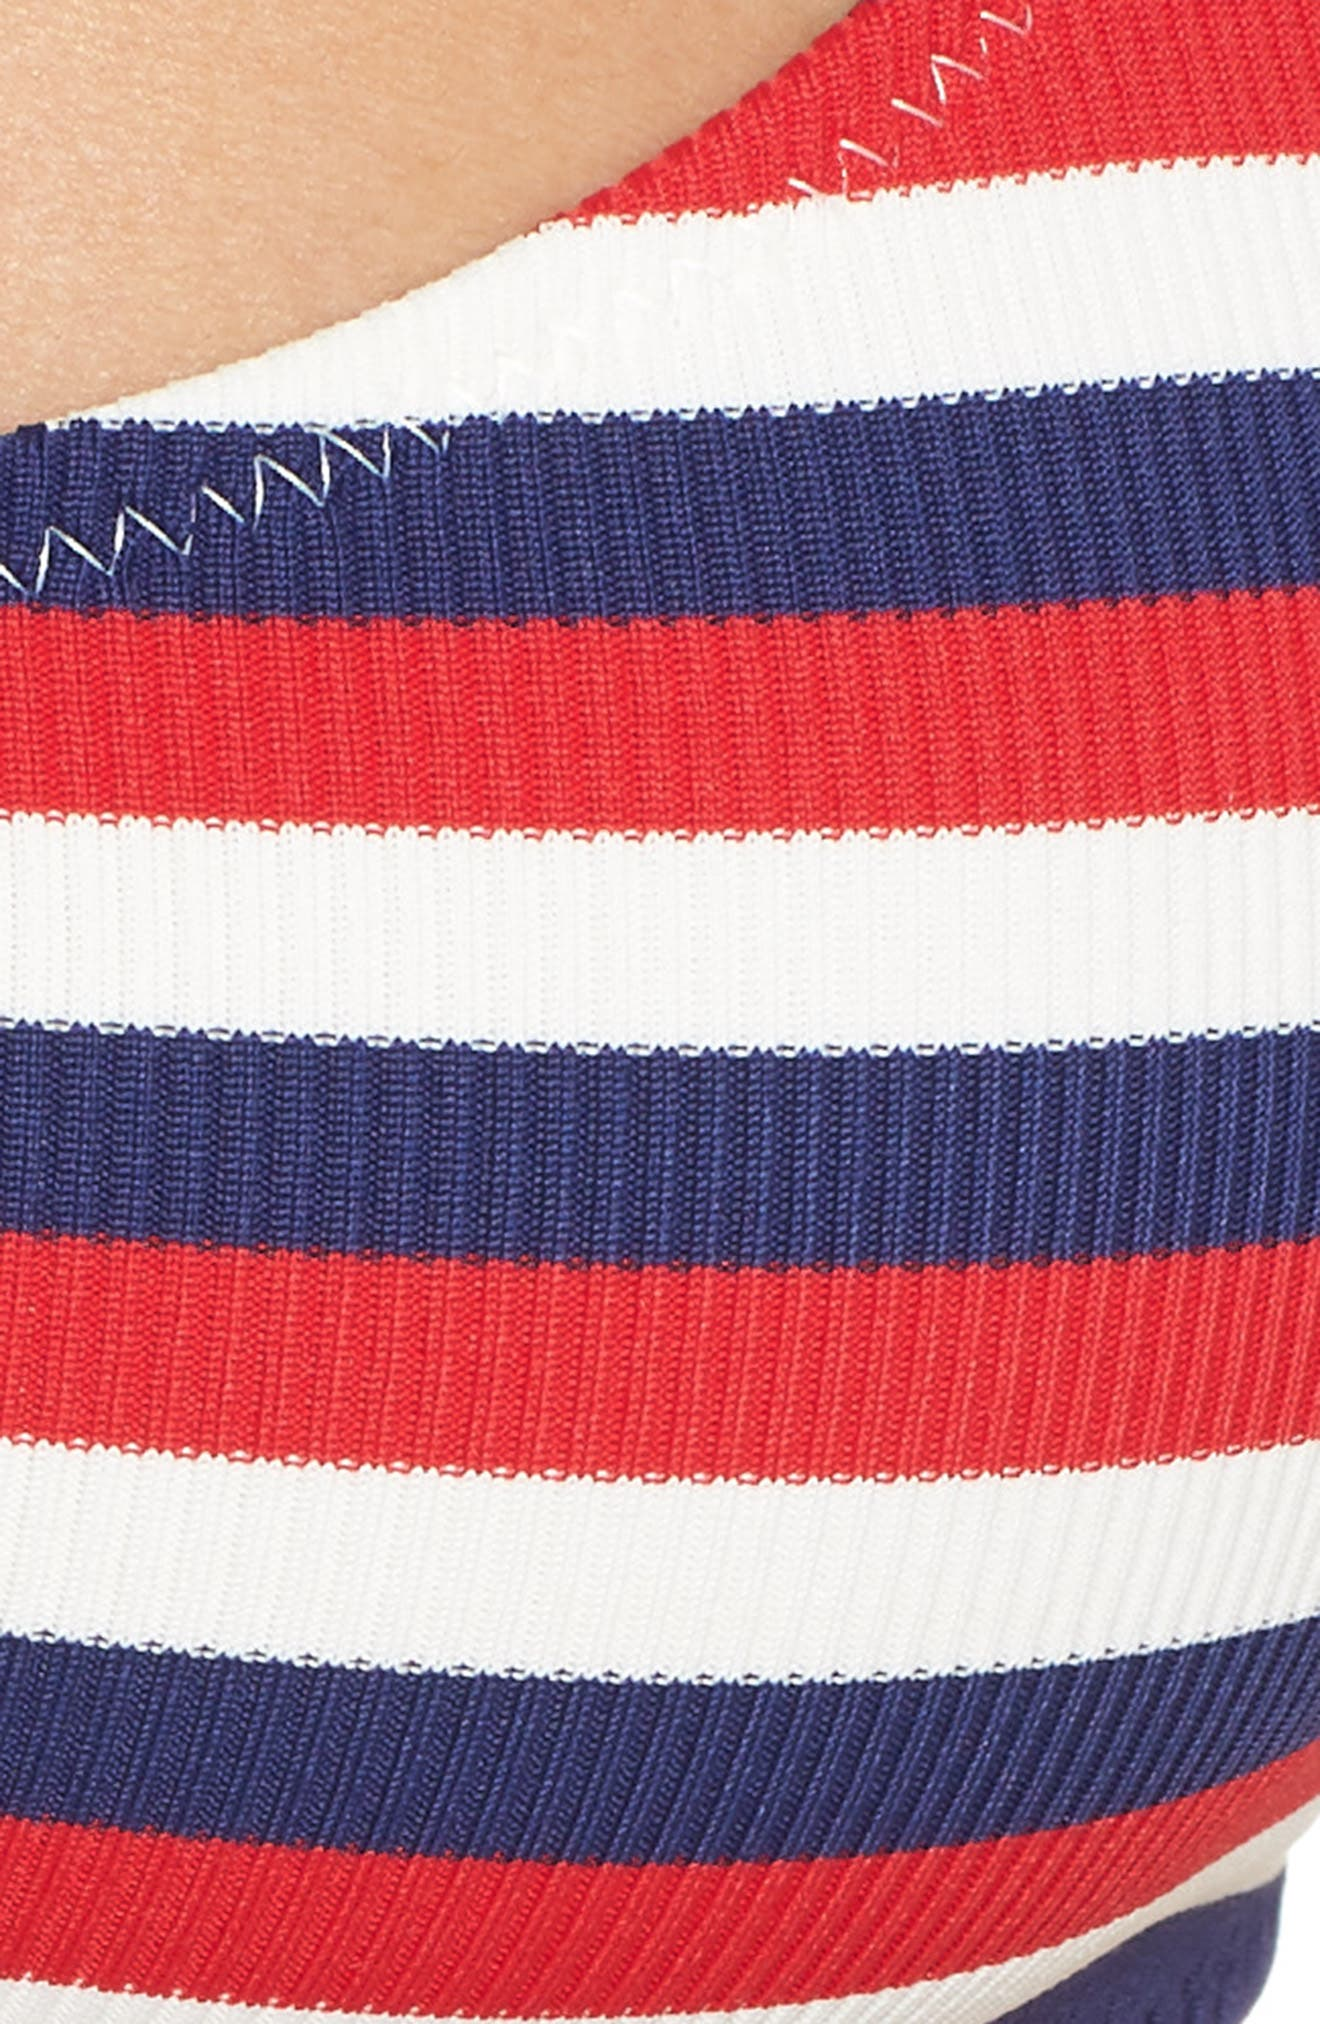 Elle Bikini Top,                             Alternate thumbnail 6, color,                             AMERICAN RIB